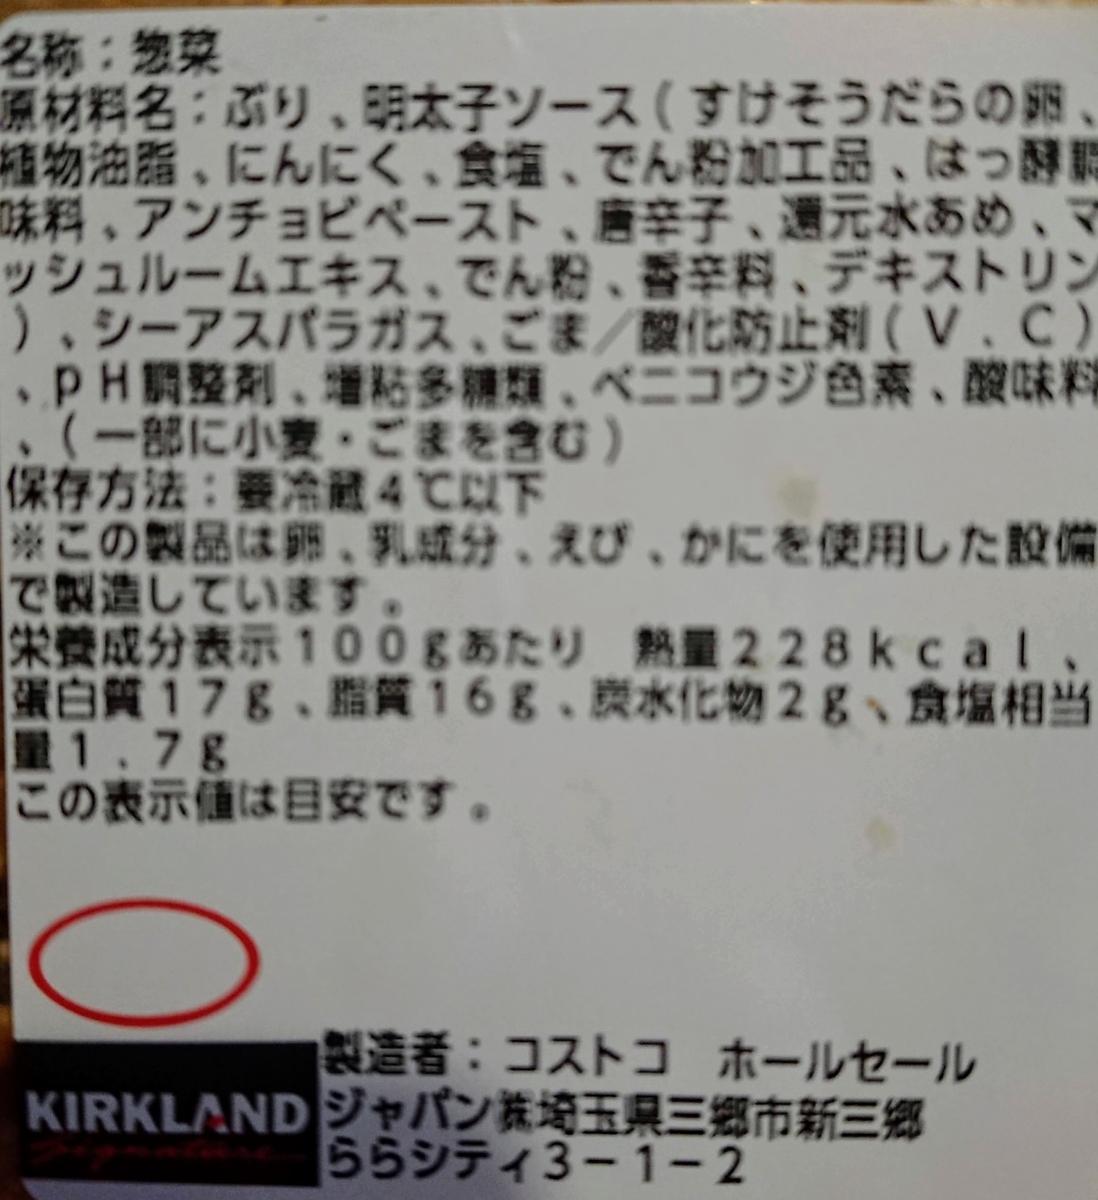 f:id:P-chanmama:20210123115711j:plain